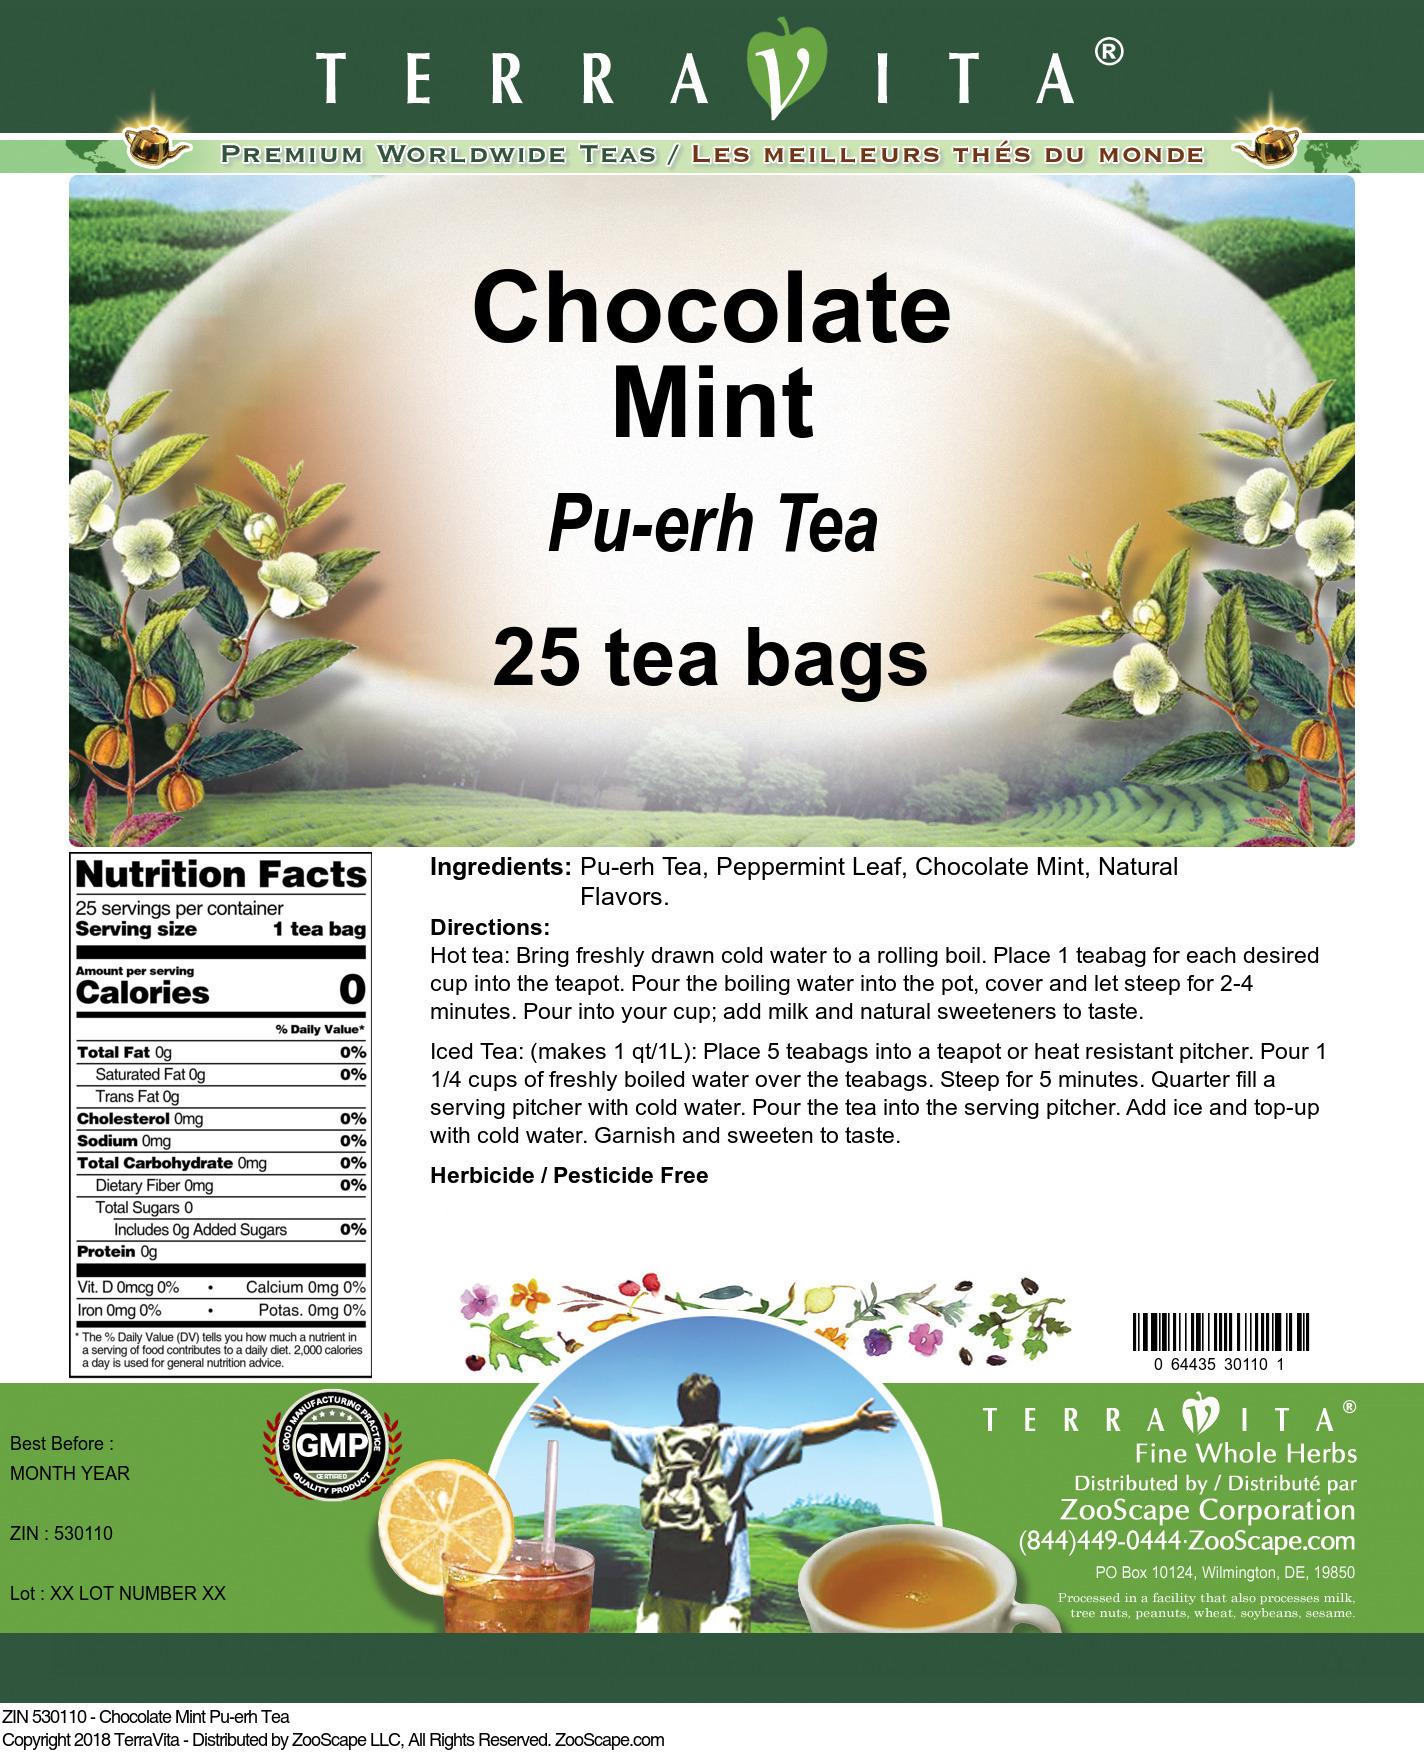 Chocolate Mint Pu-erh Tea